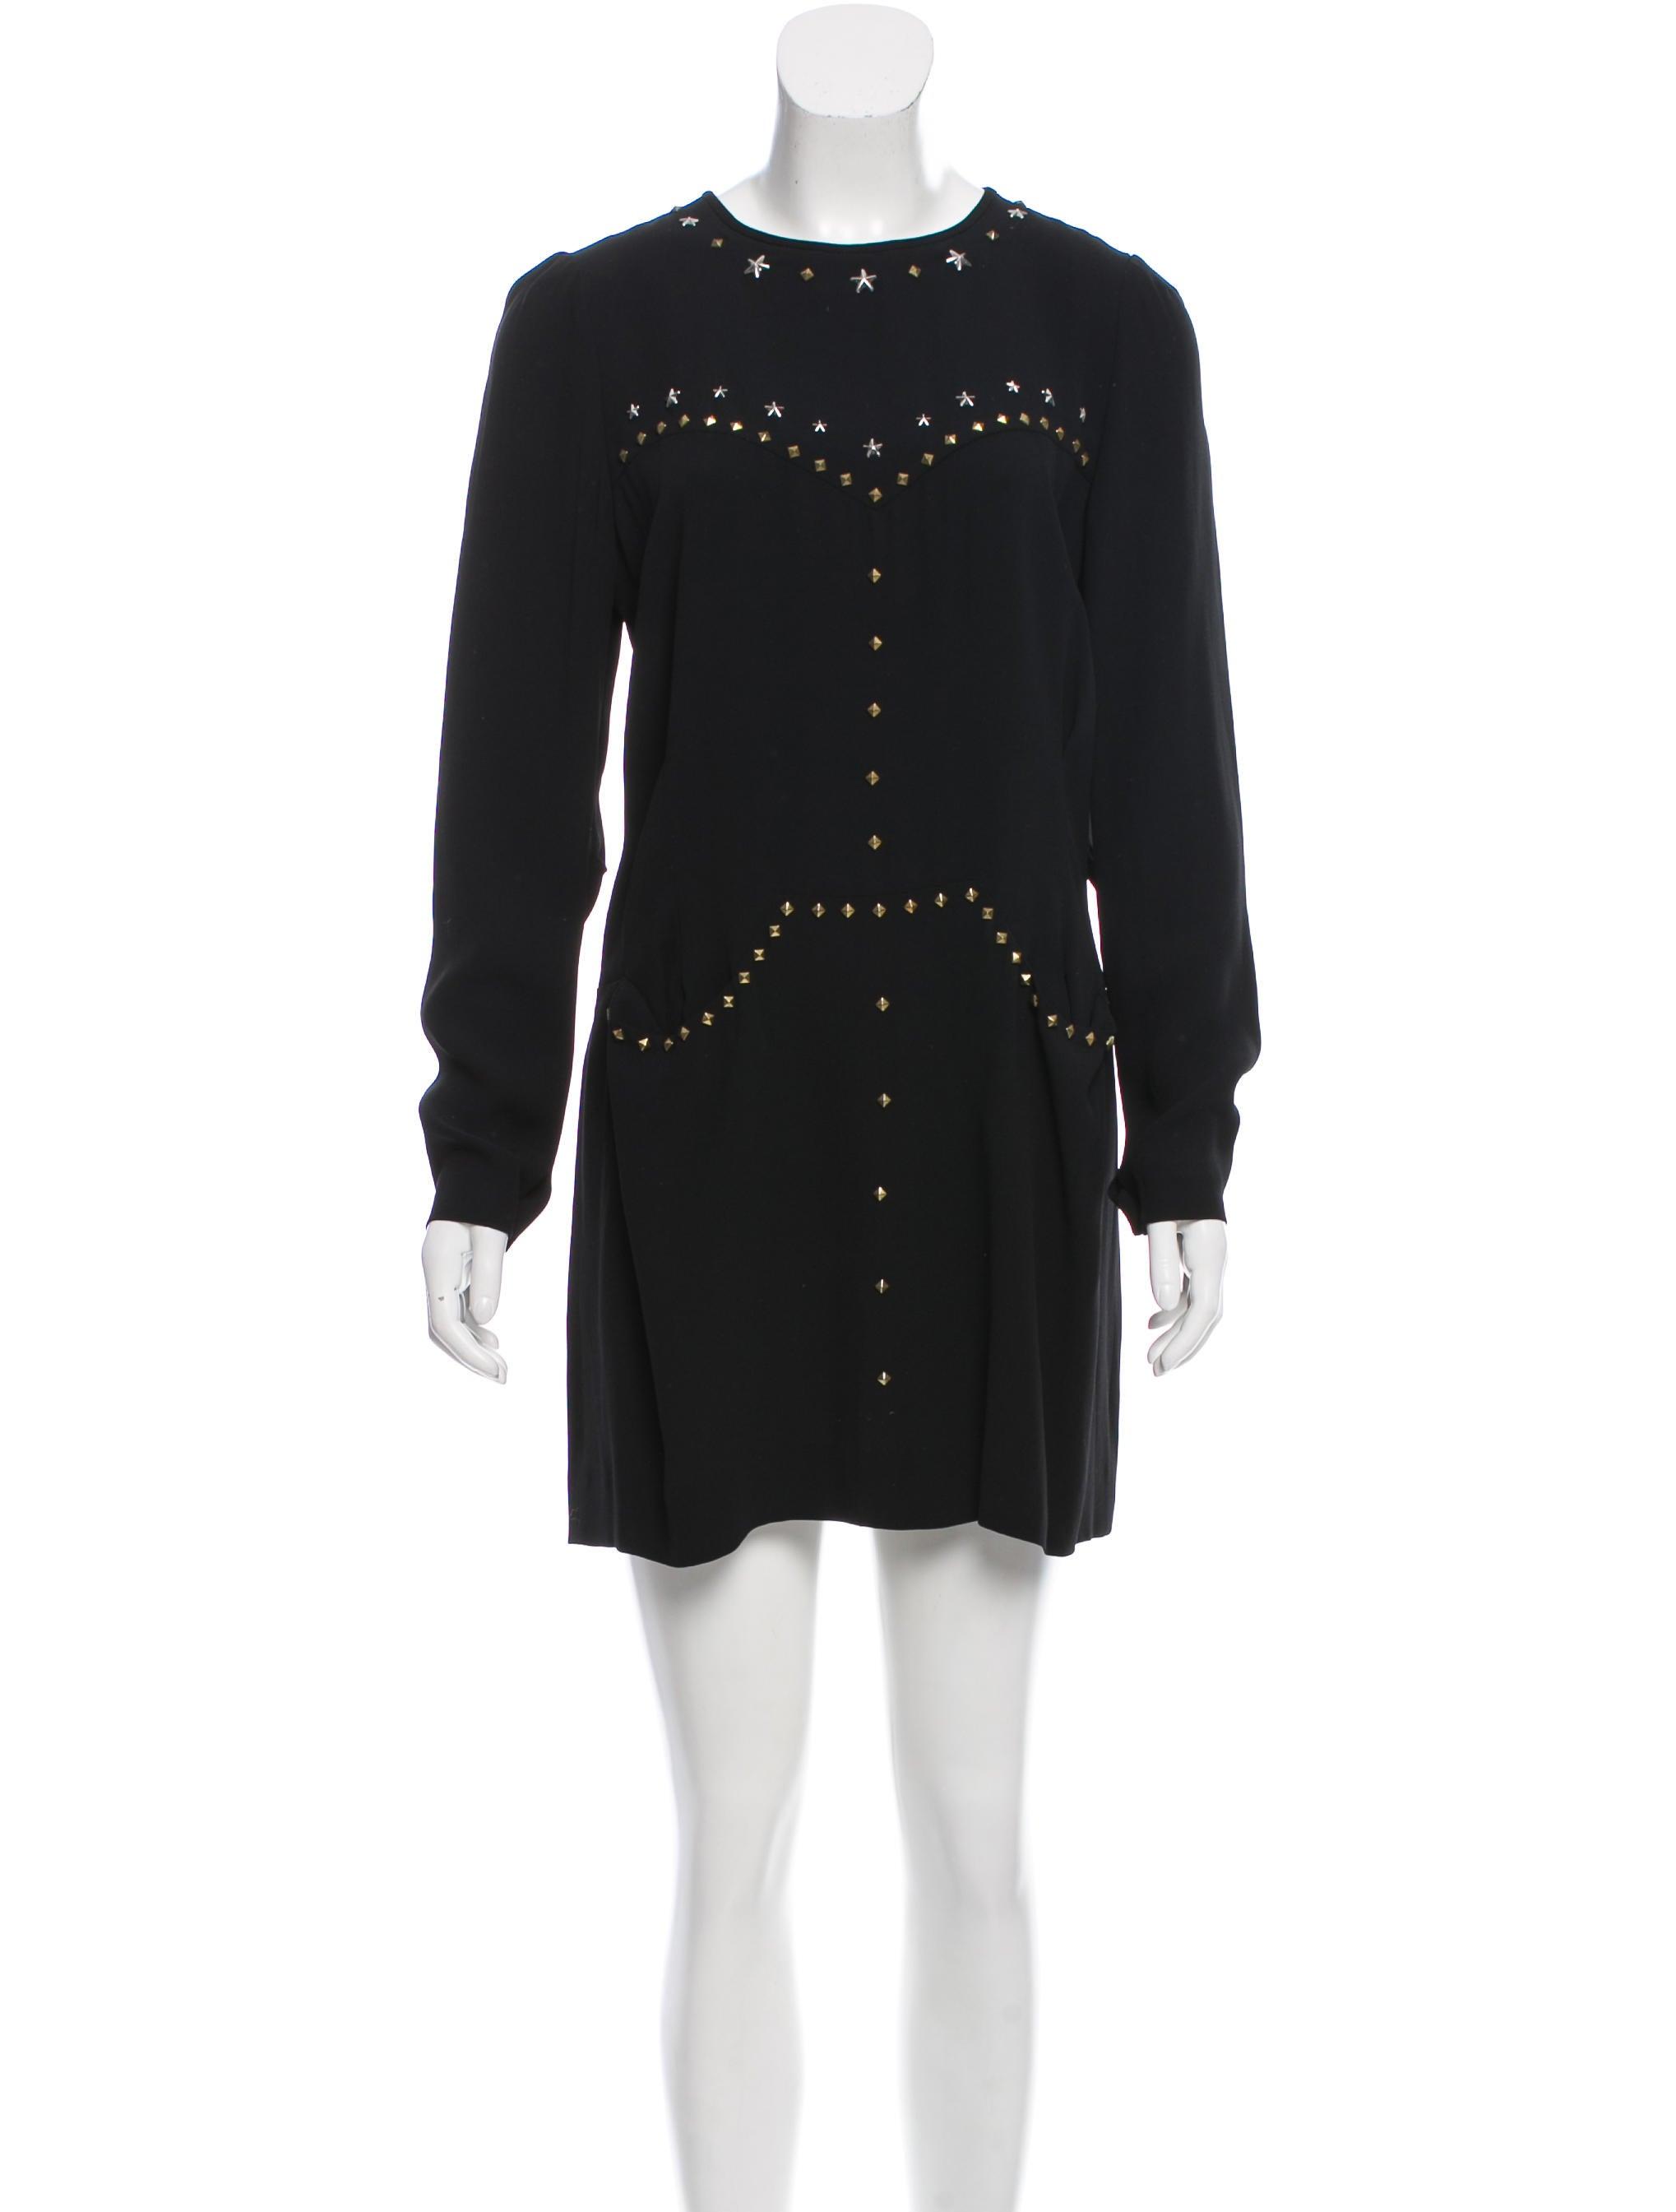 Isabel marant star stud embellished dress clothing for Isabel marant shirt dress